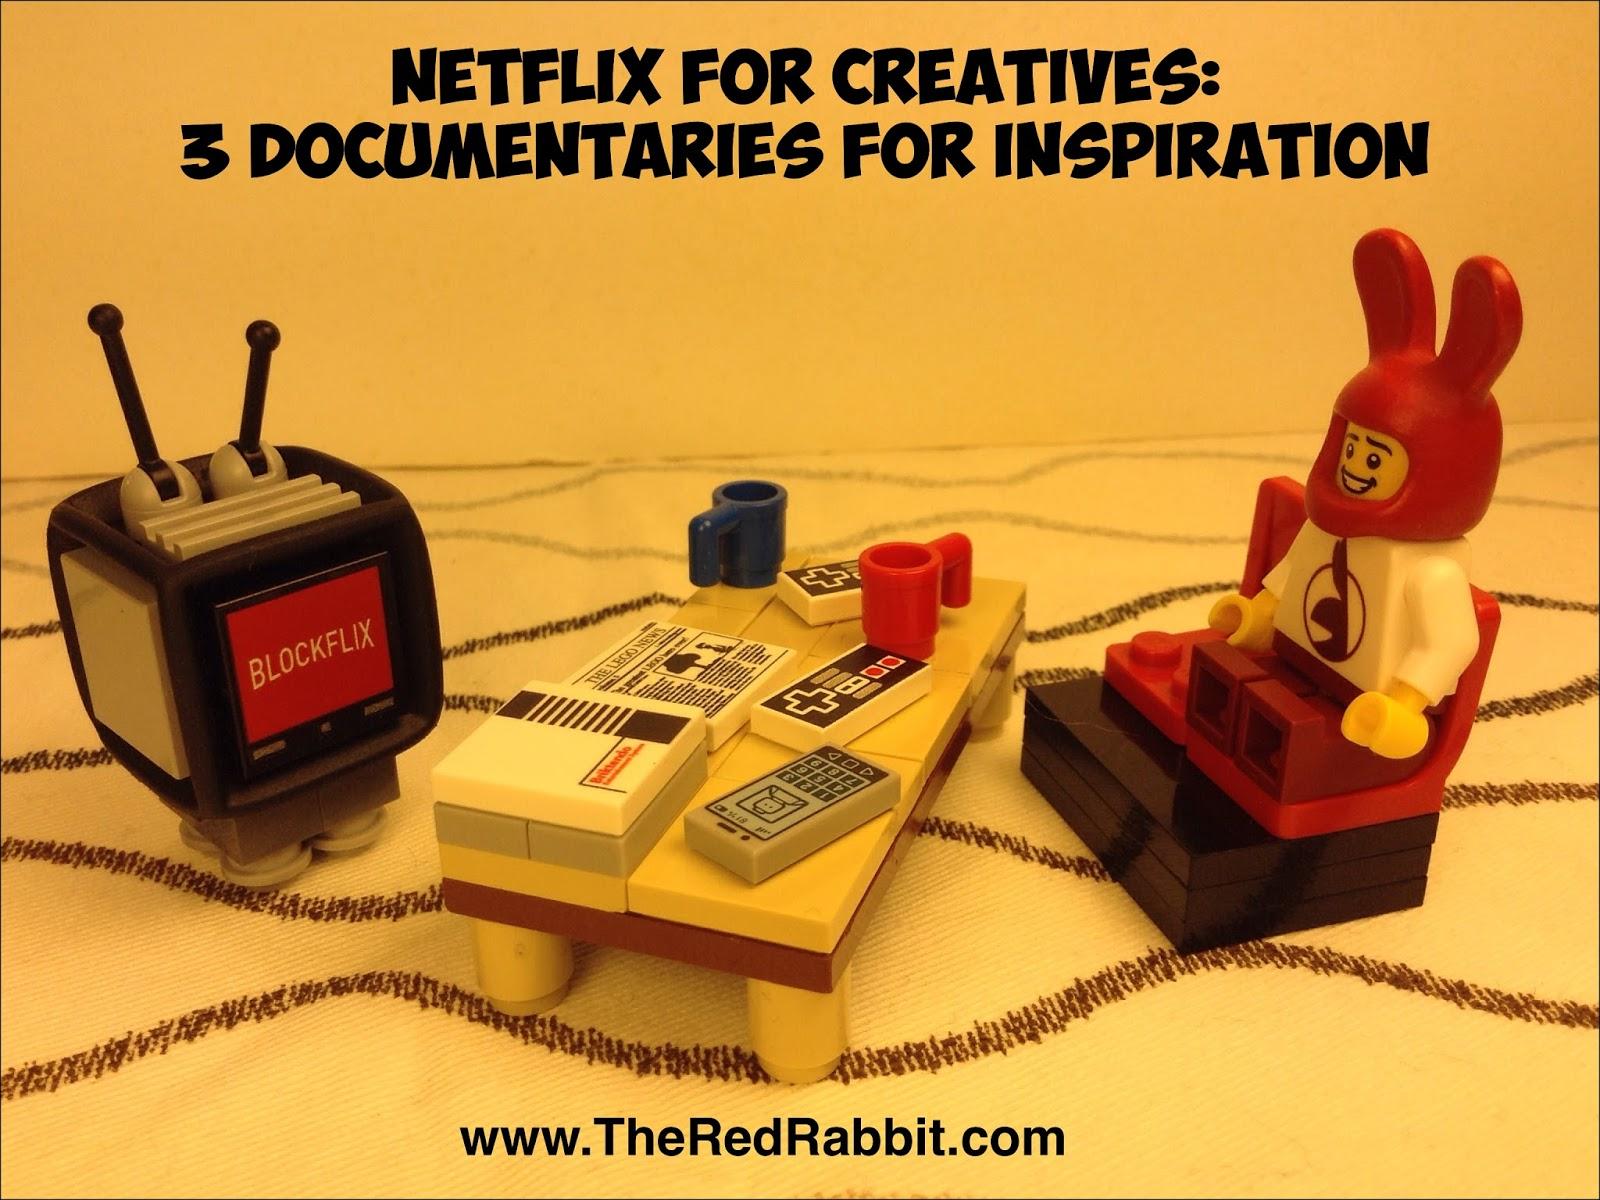 Netflix: The Red Rabbit Studio